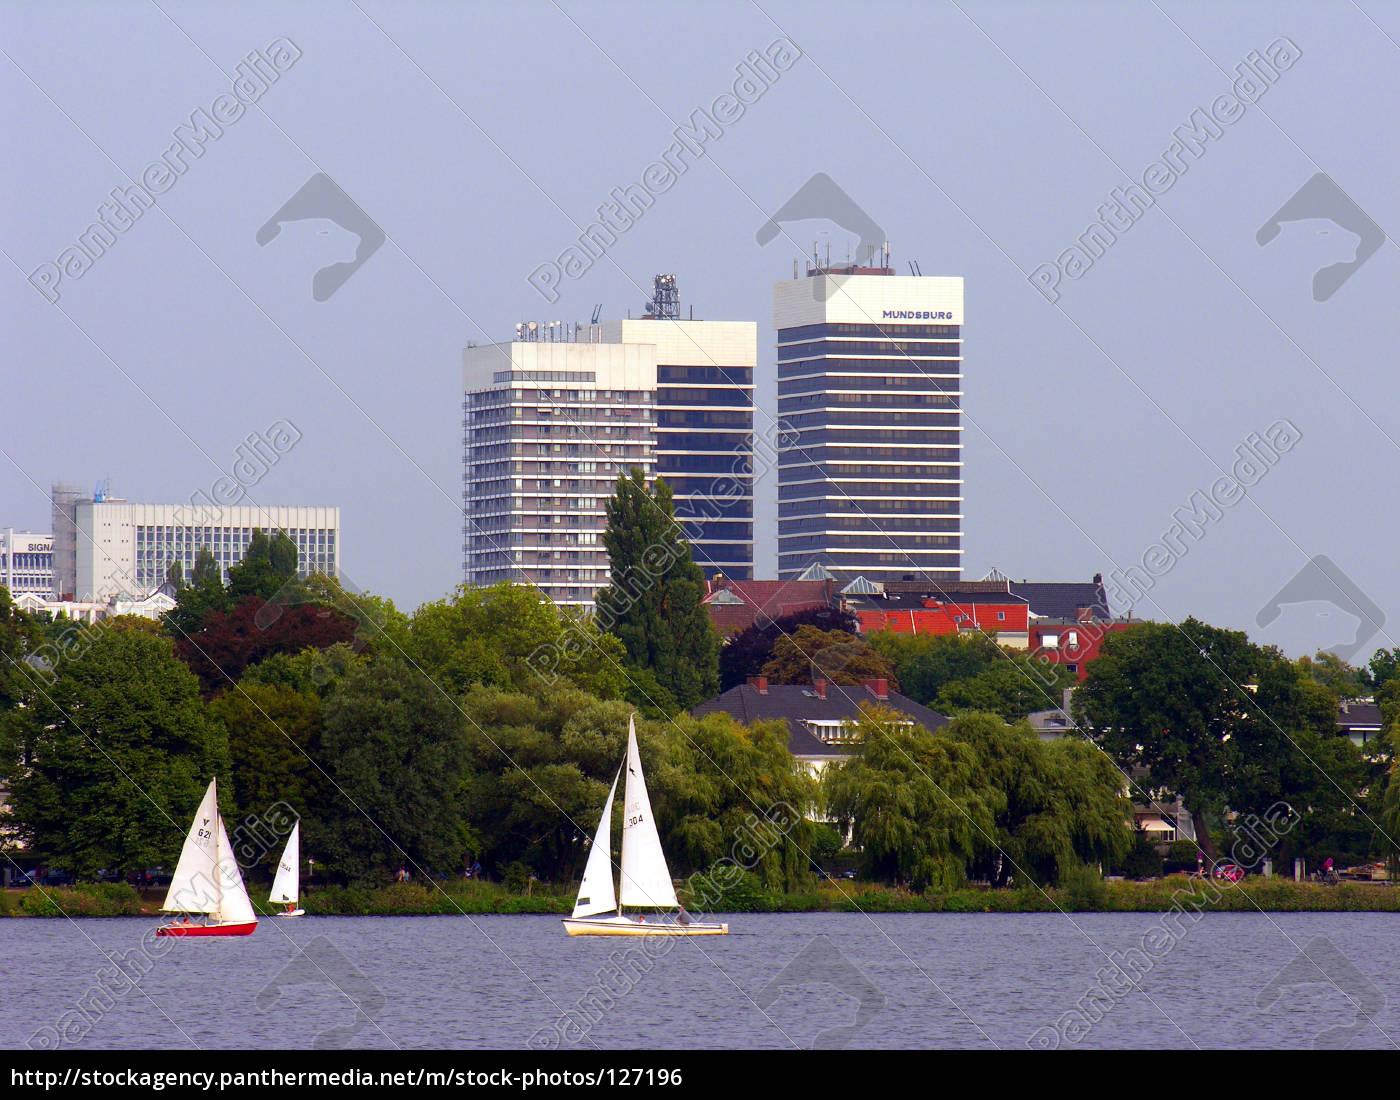 the, mundsburg, skyscrapers - 127196